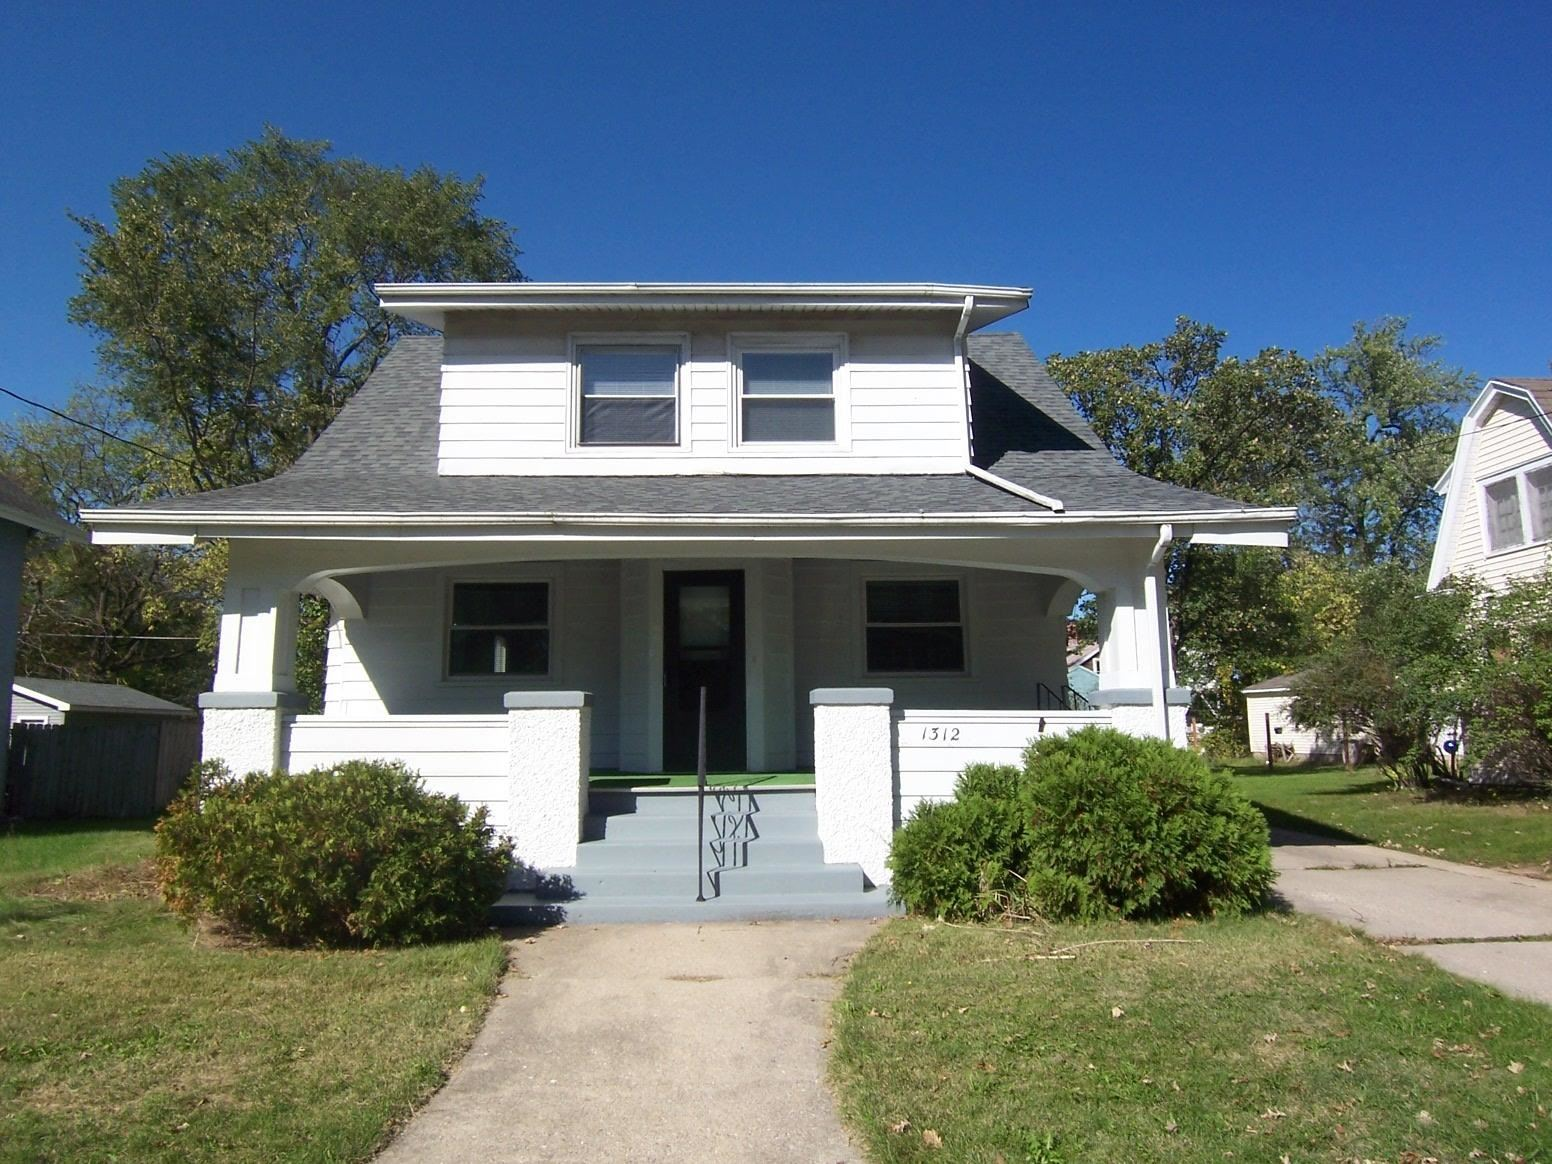 1312 Prairie Ave, Beloit, WI 53511 - #: 1922206